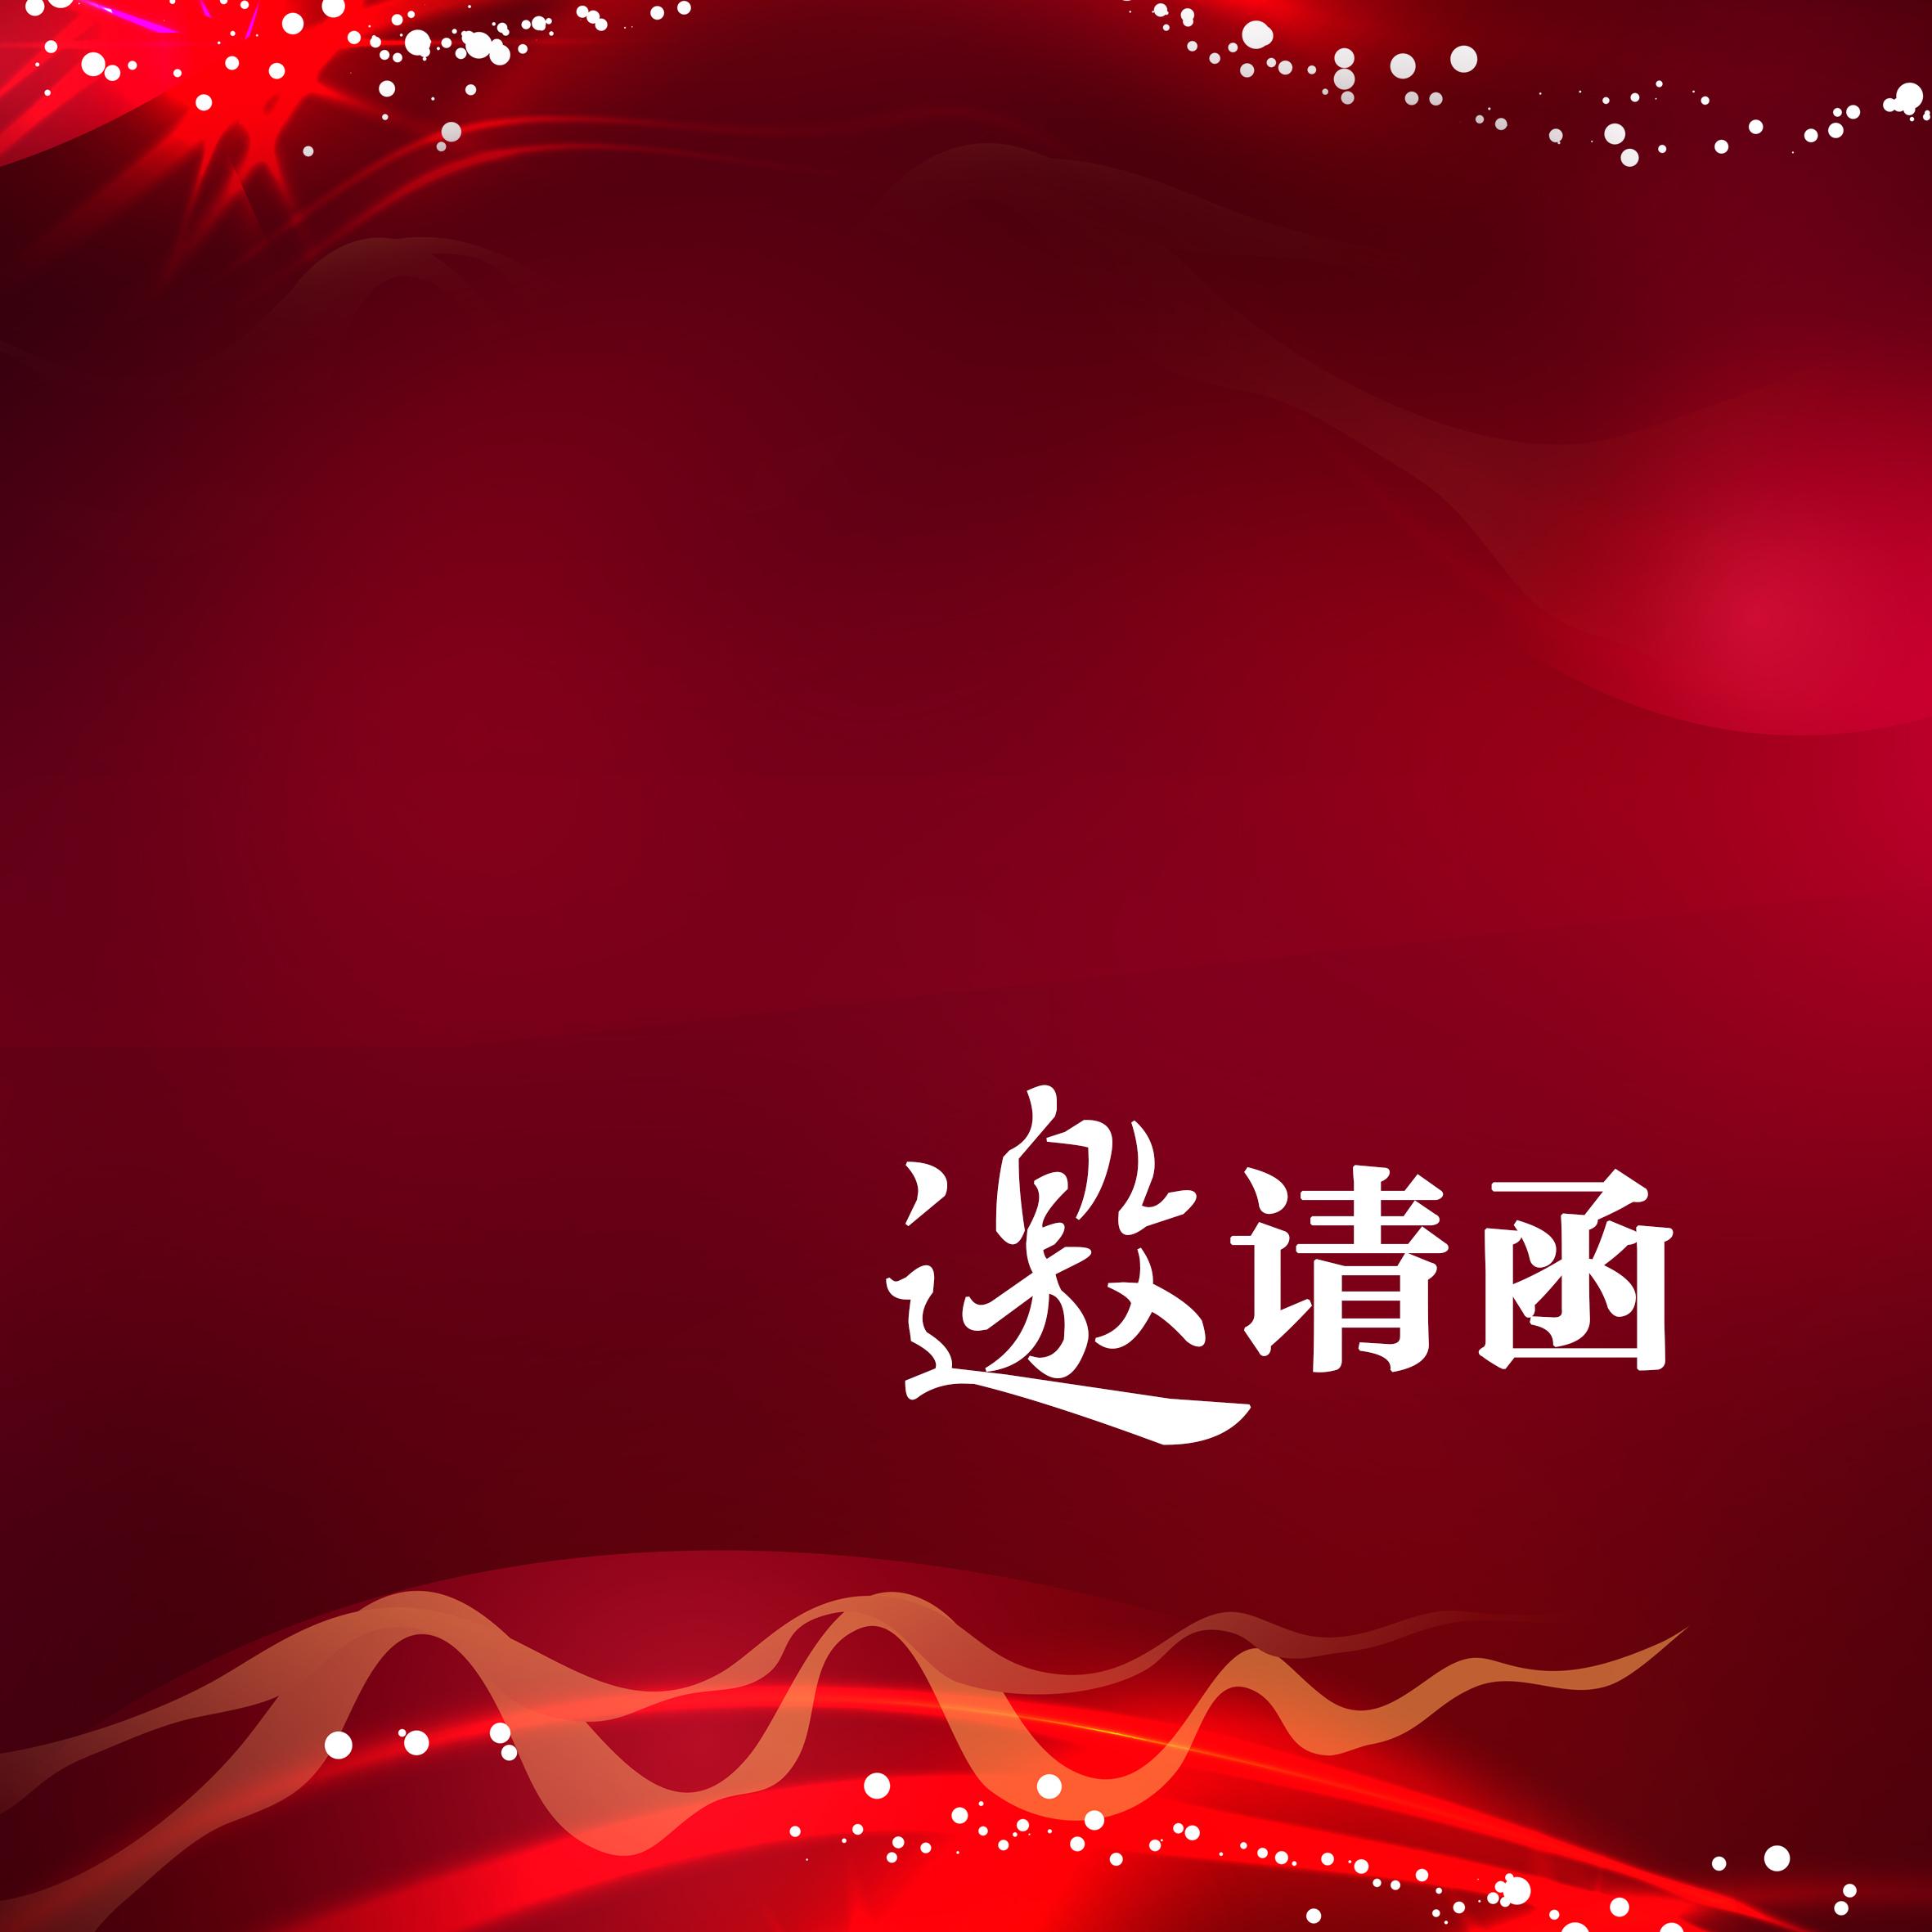 Red Wedding Invitation Background, Invitation Card, Red, Gradual ...